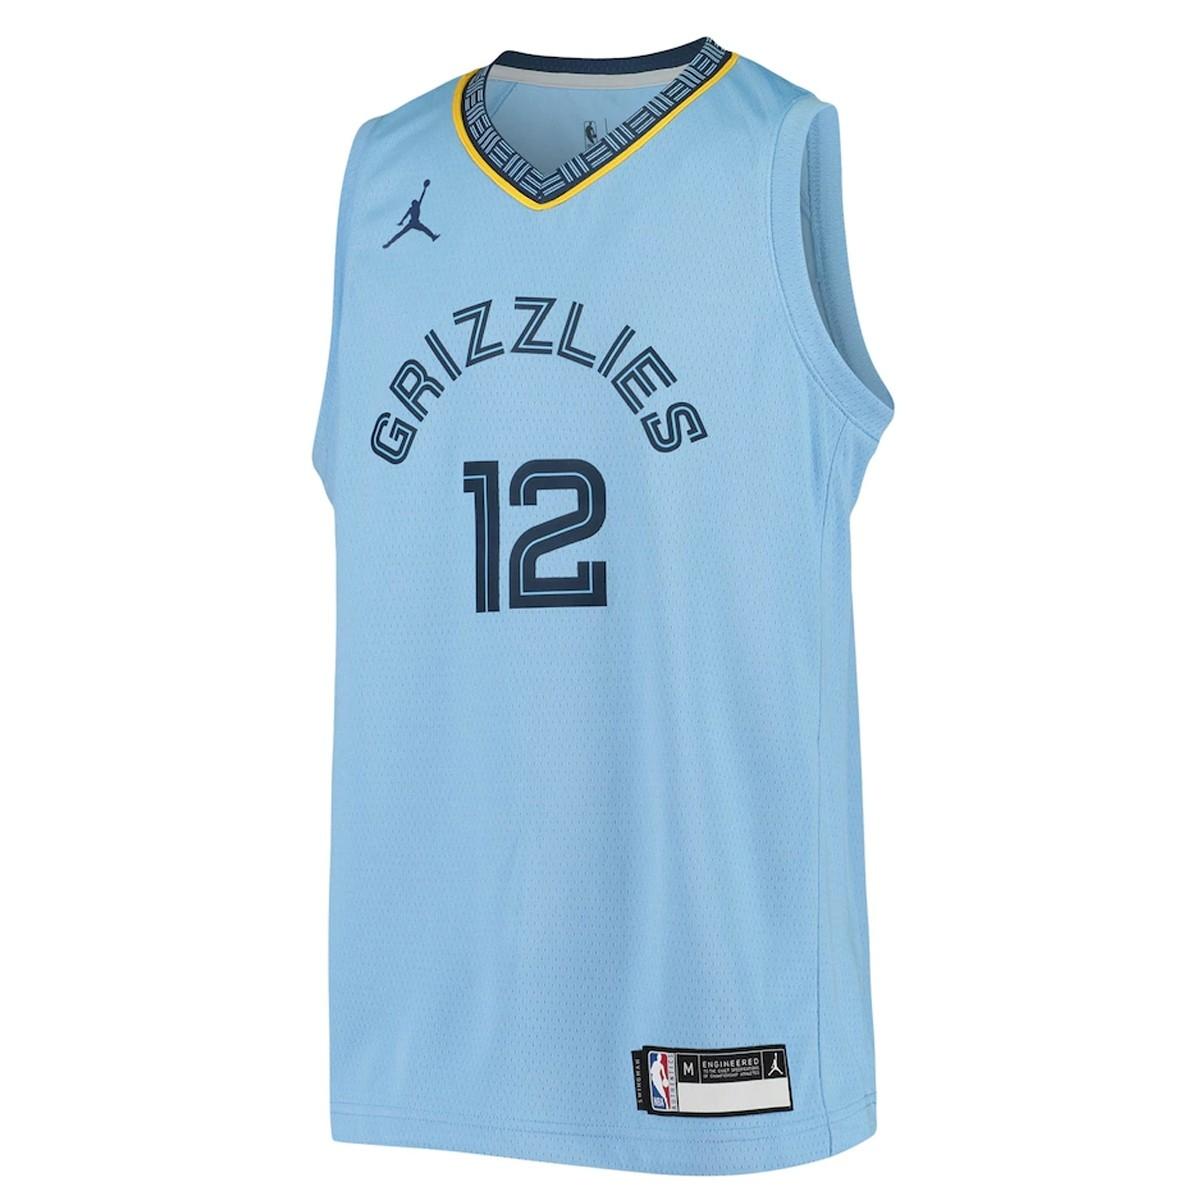 Jordan Jr NBA Memphis Grizzlies Swingman Jersey Ja Morant 'Statement Edition'